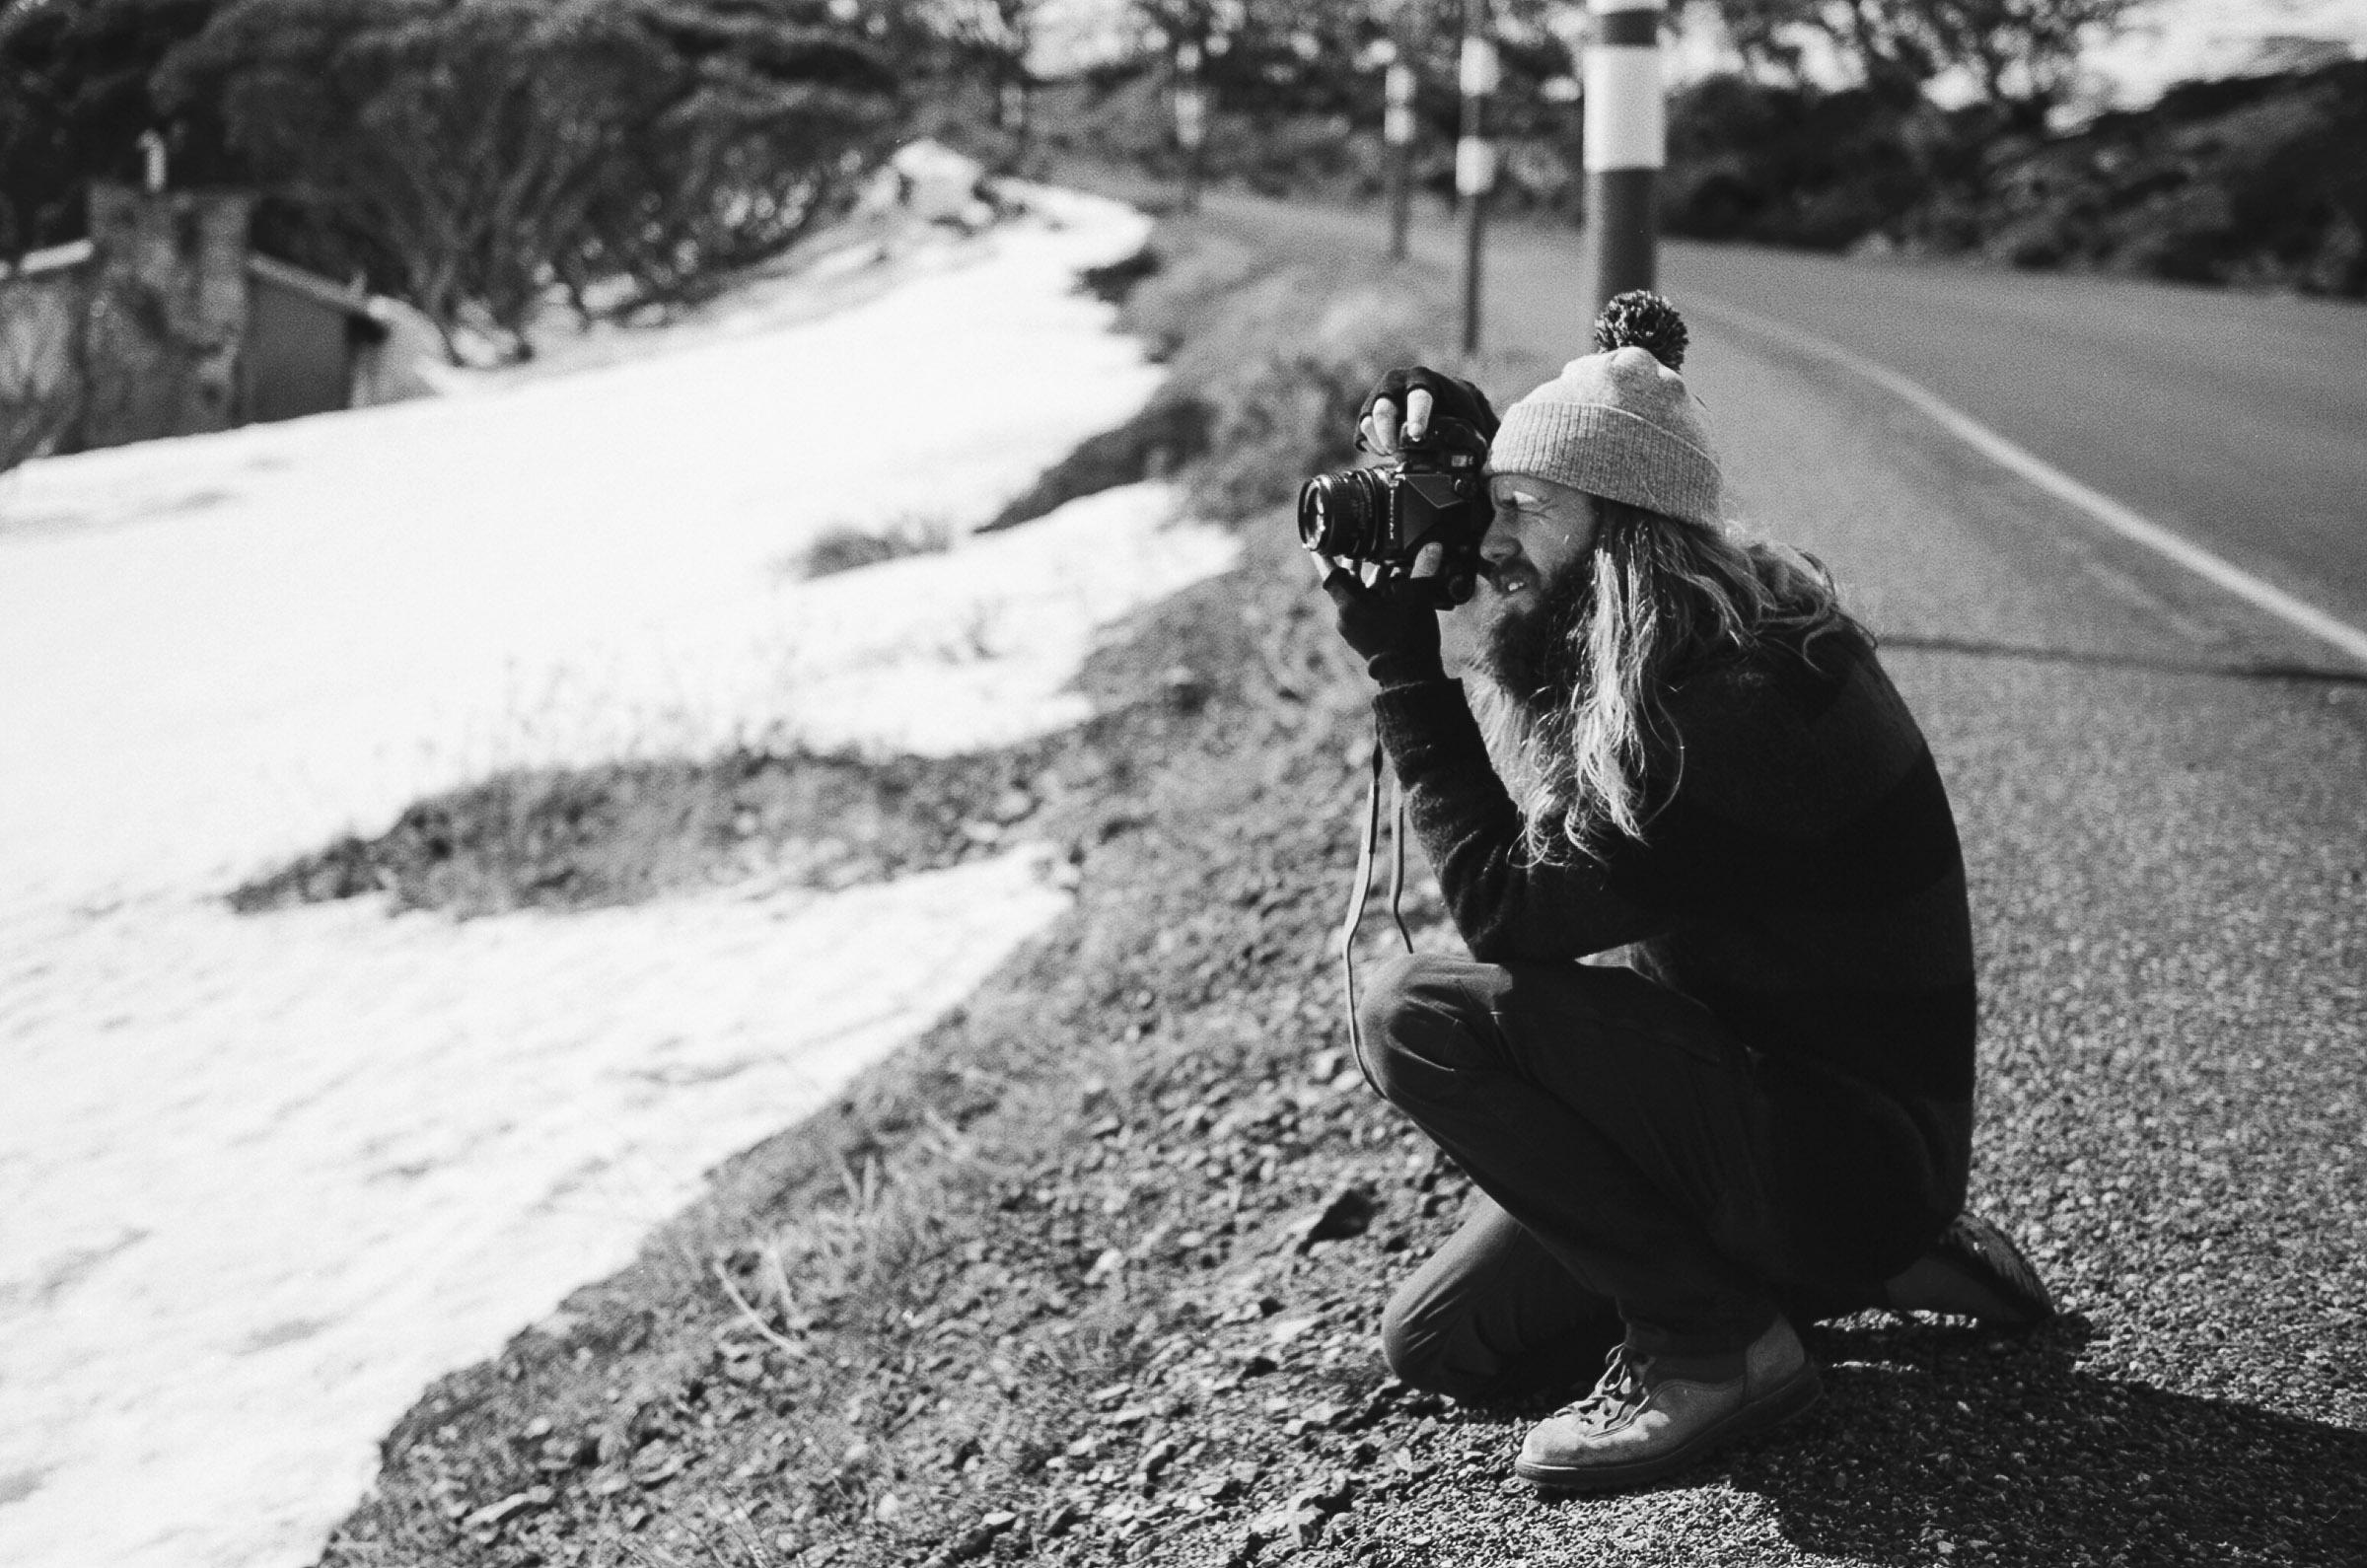 Best_of_2019_film_analog_shots-79.jpg